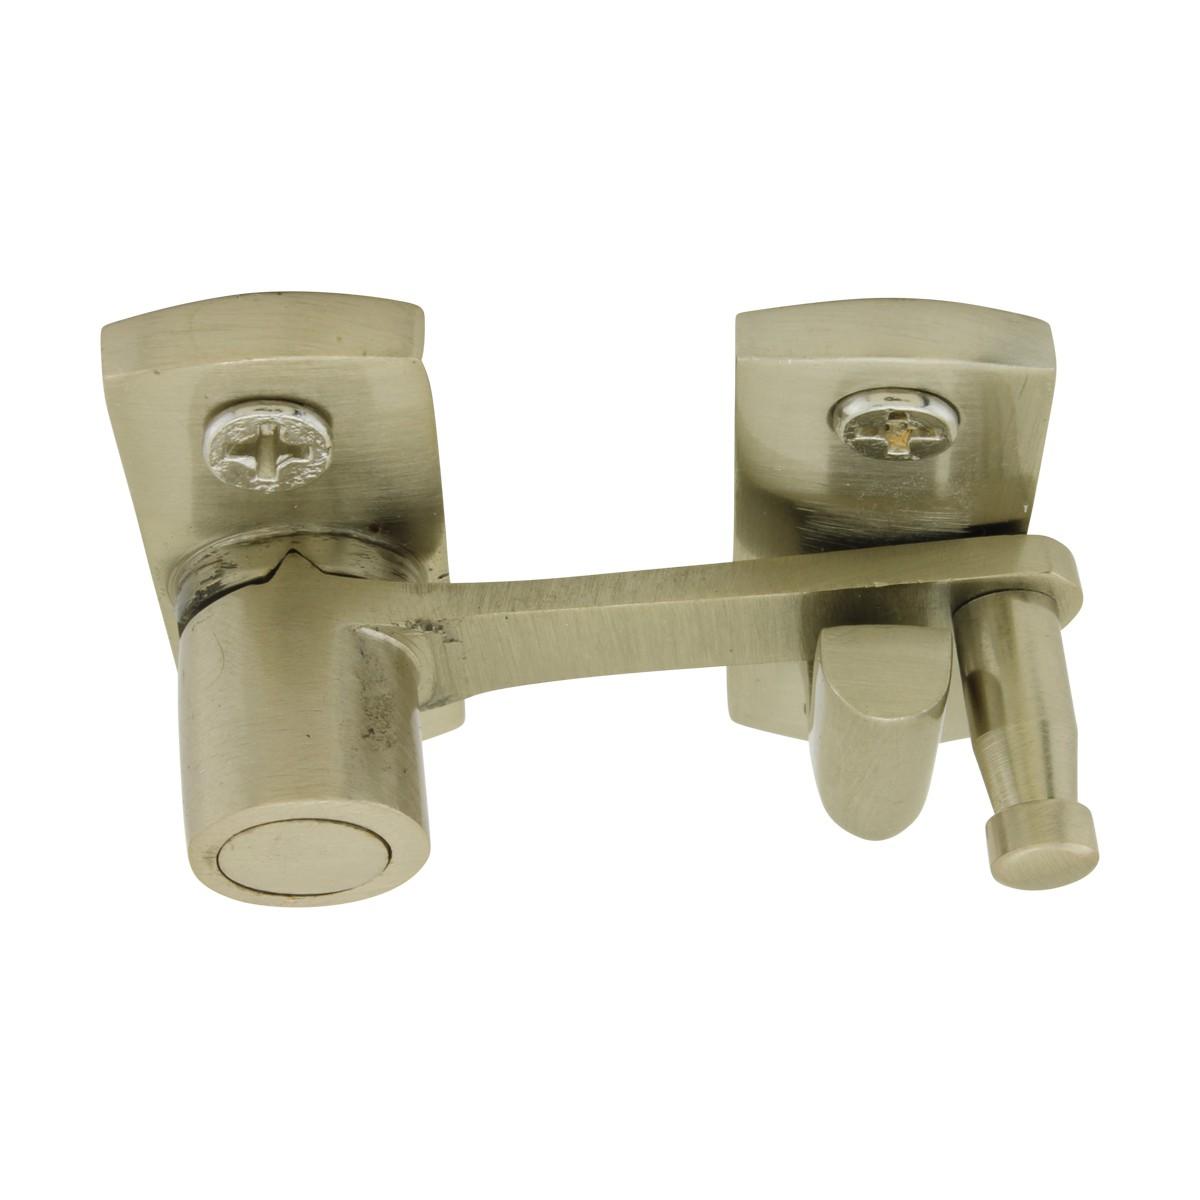 Cabinet Cupboard Pantry Flush Mount Satin Nickel Modern Unique Decorative Rust Proof Latch Catch Lock Security